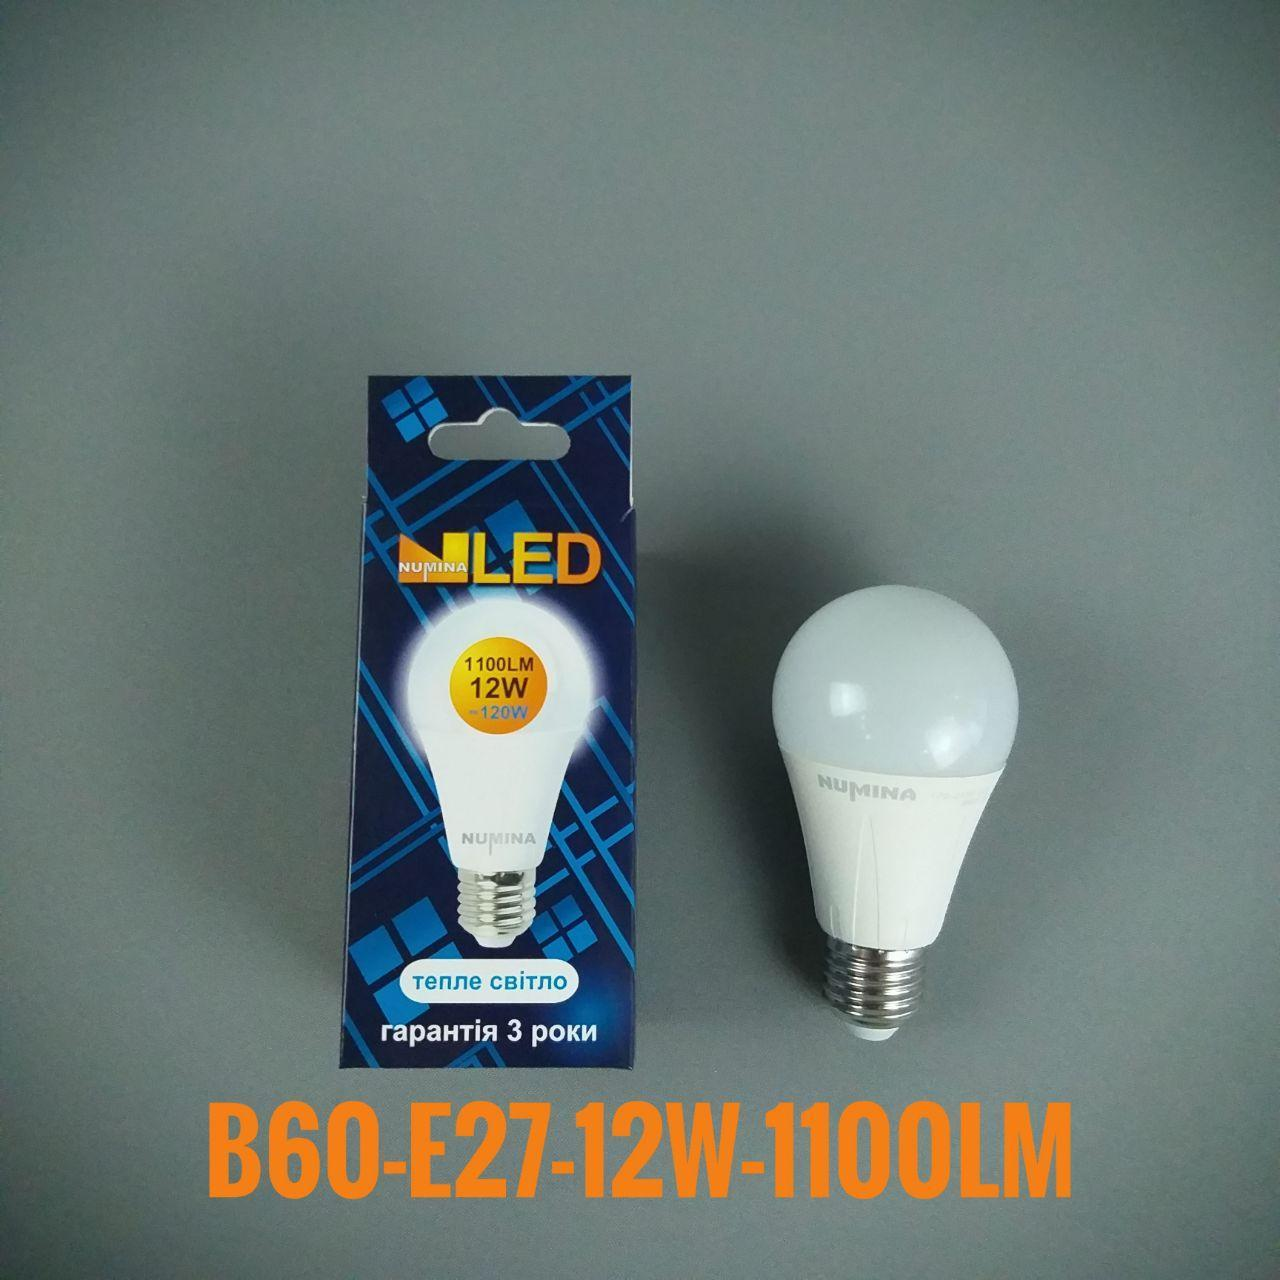 Светодиодная лампочка LAMP PREMIUM B60AP 12W E27 3000K 270